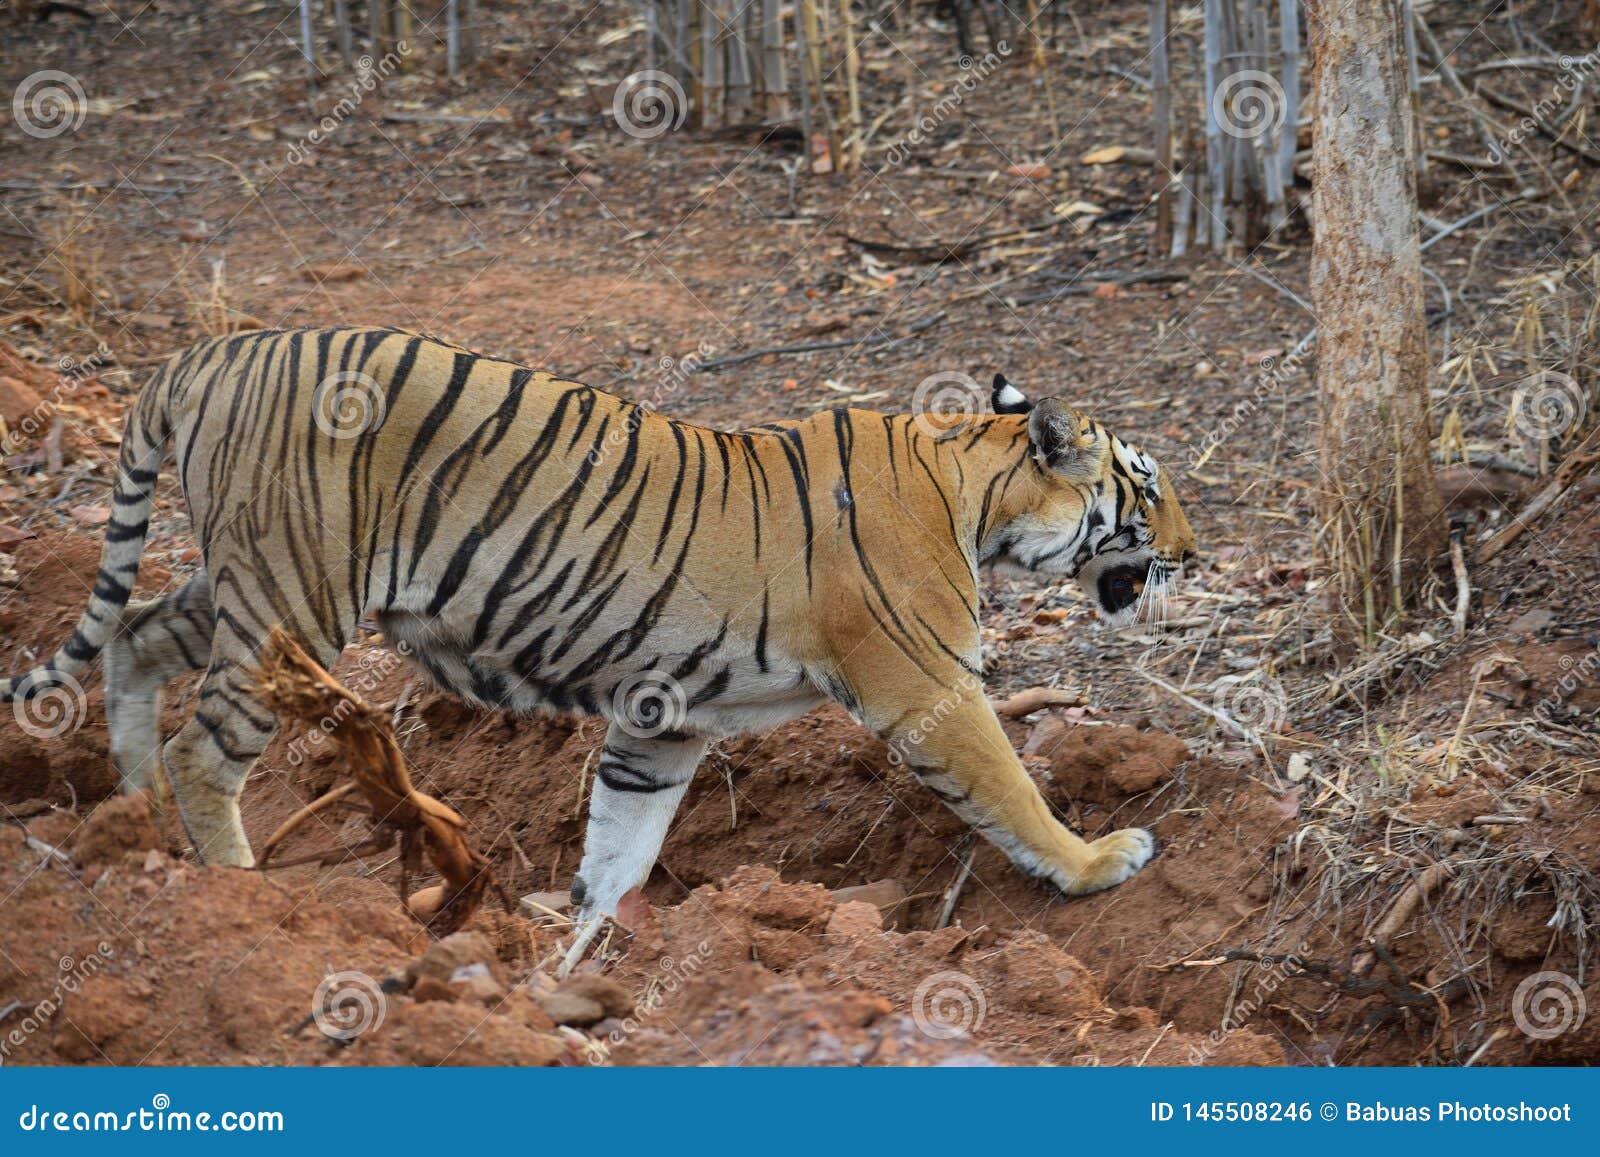 Tigre de Bengal real que anda através de uma vala em Tadoba Tiger Reserve, Índia